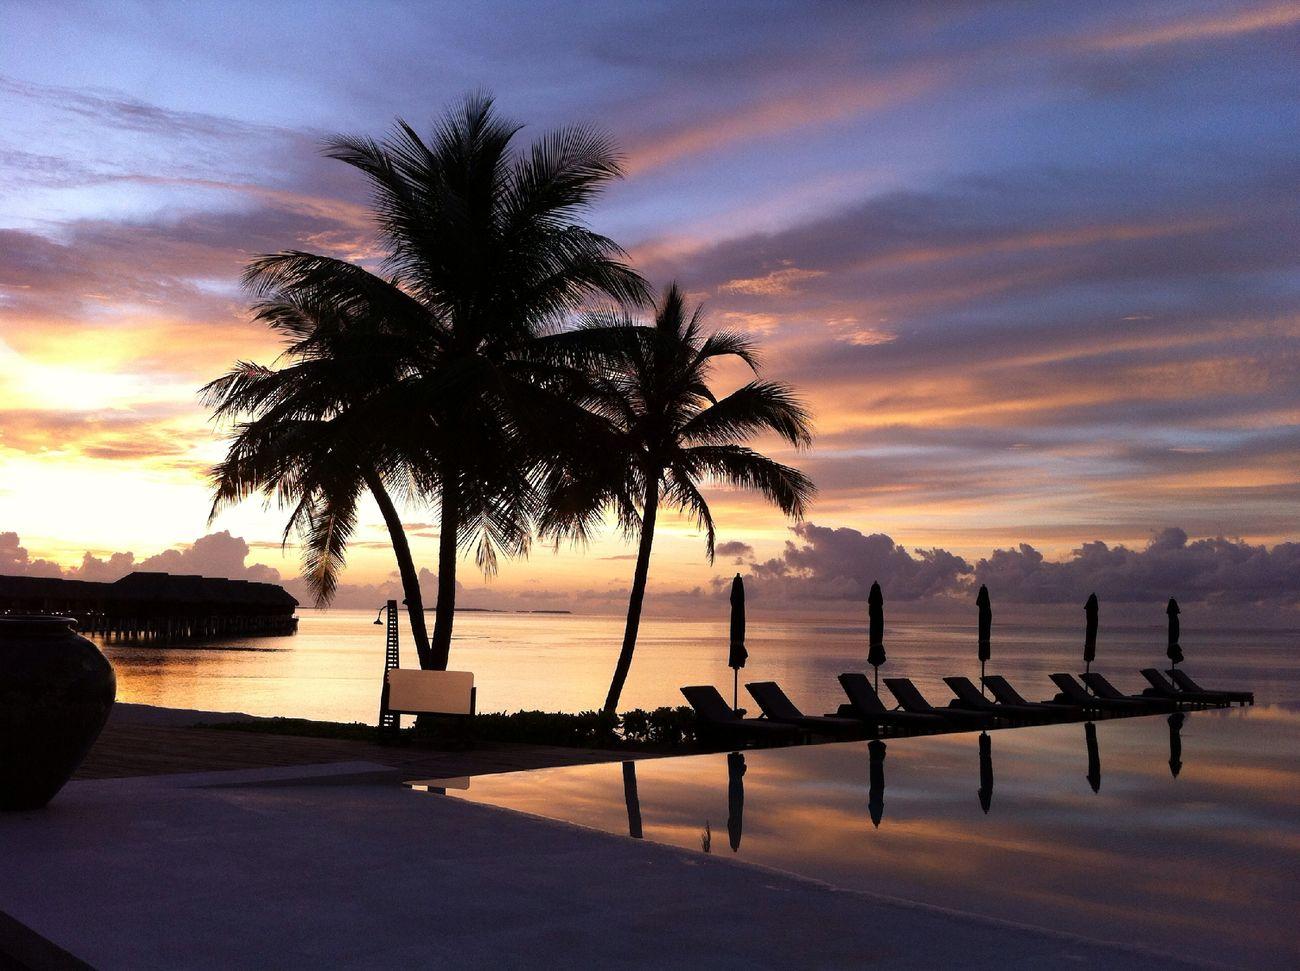 sunset at LUX* Maldives Sunset